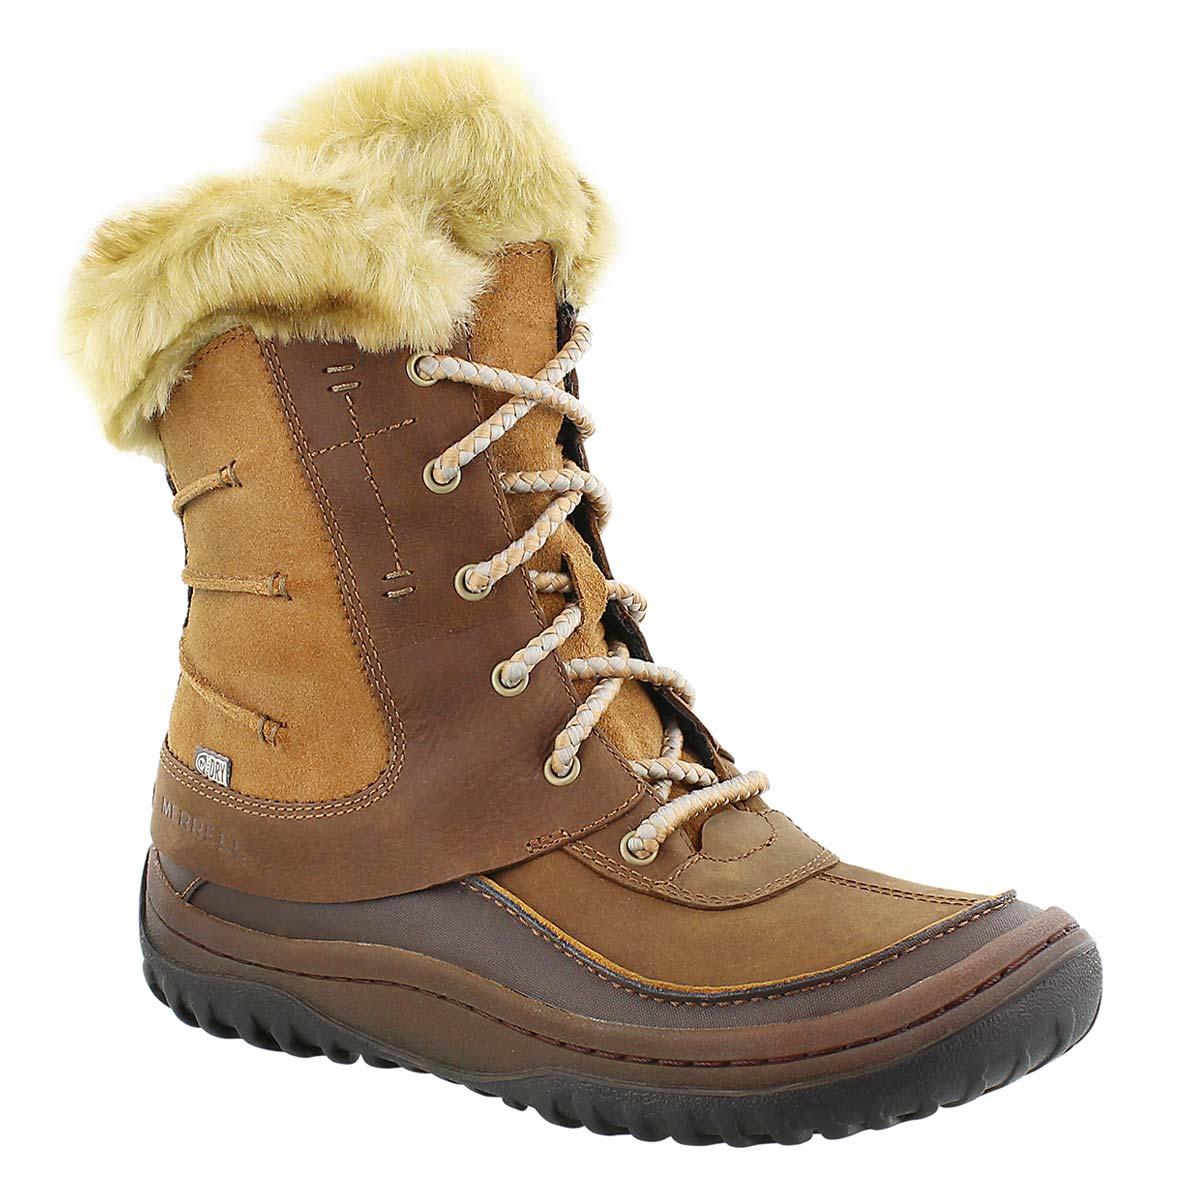 Lds Sonata brn sugar wtrpf winter boot